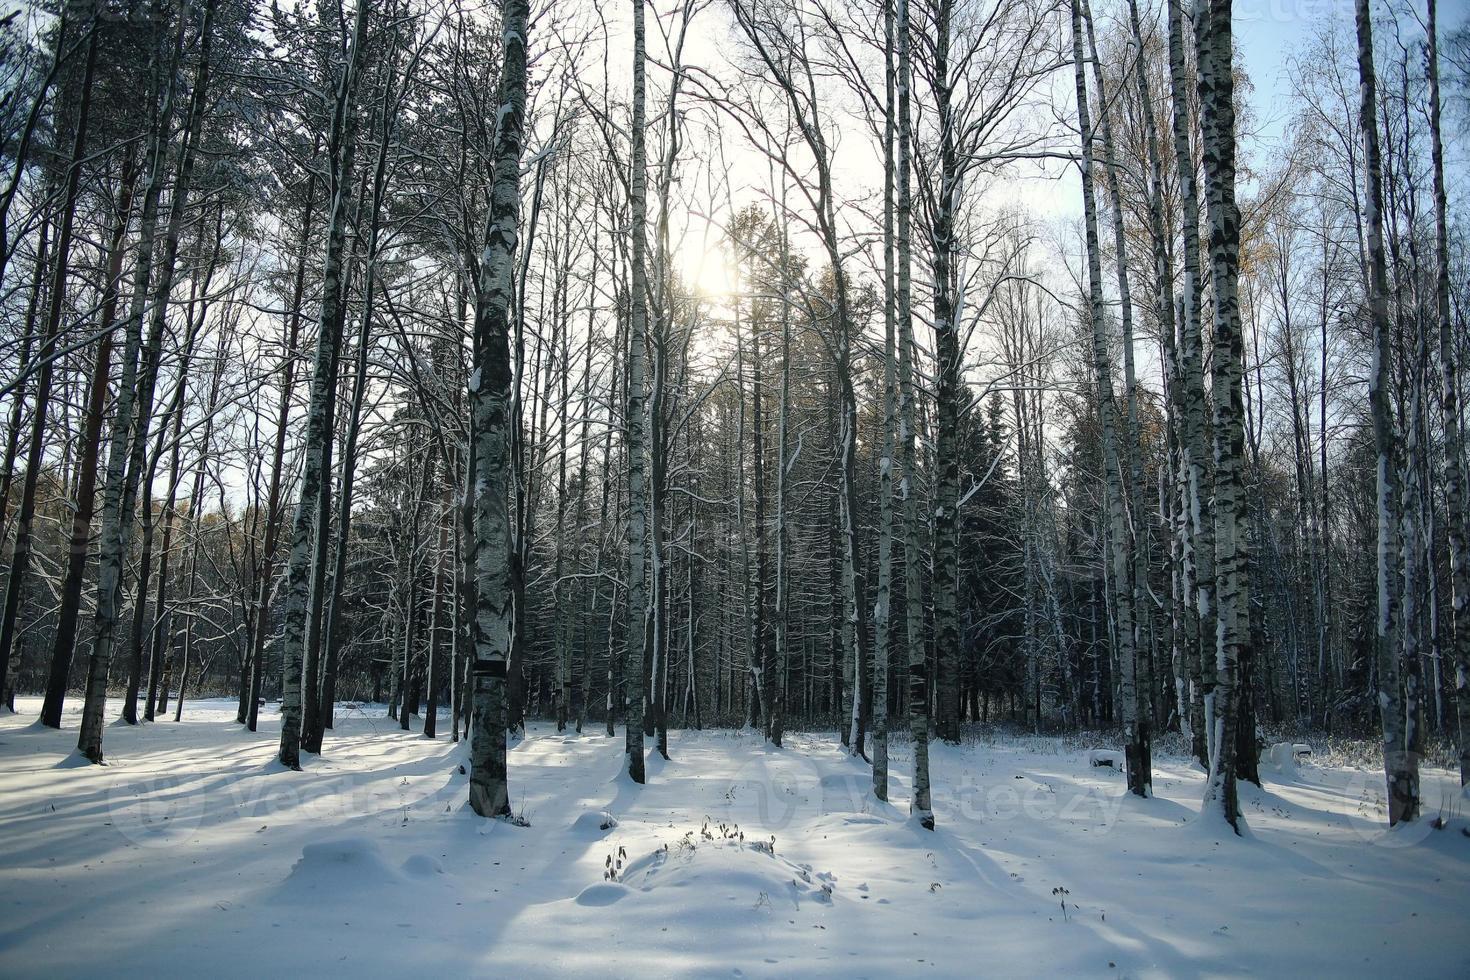 Landschaft Winter Schneewald foto